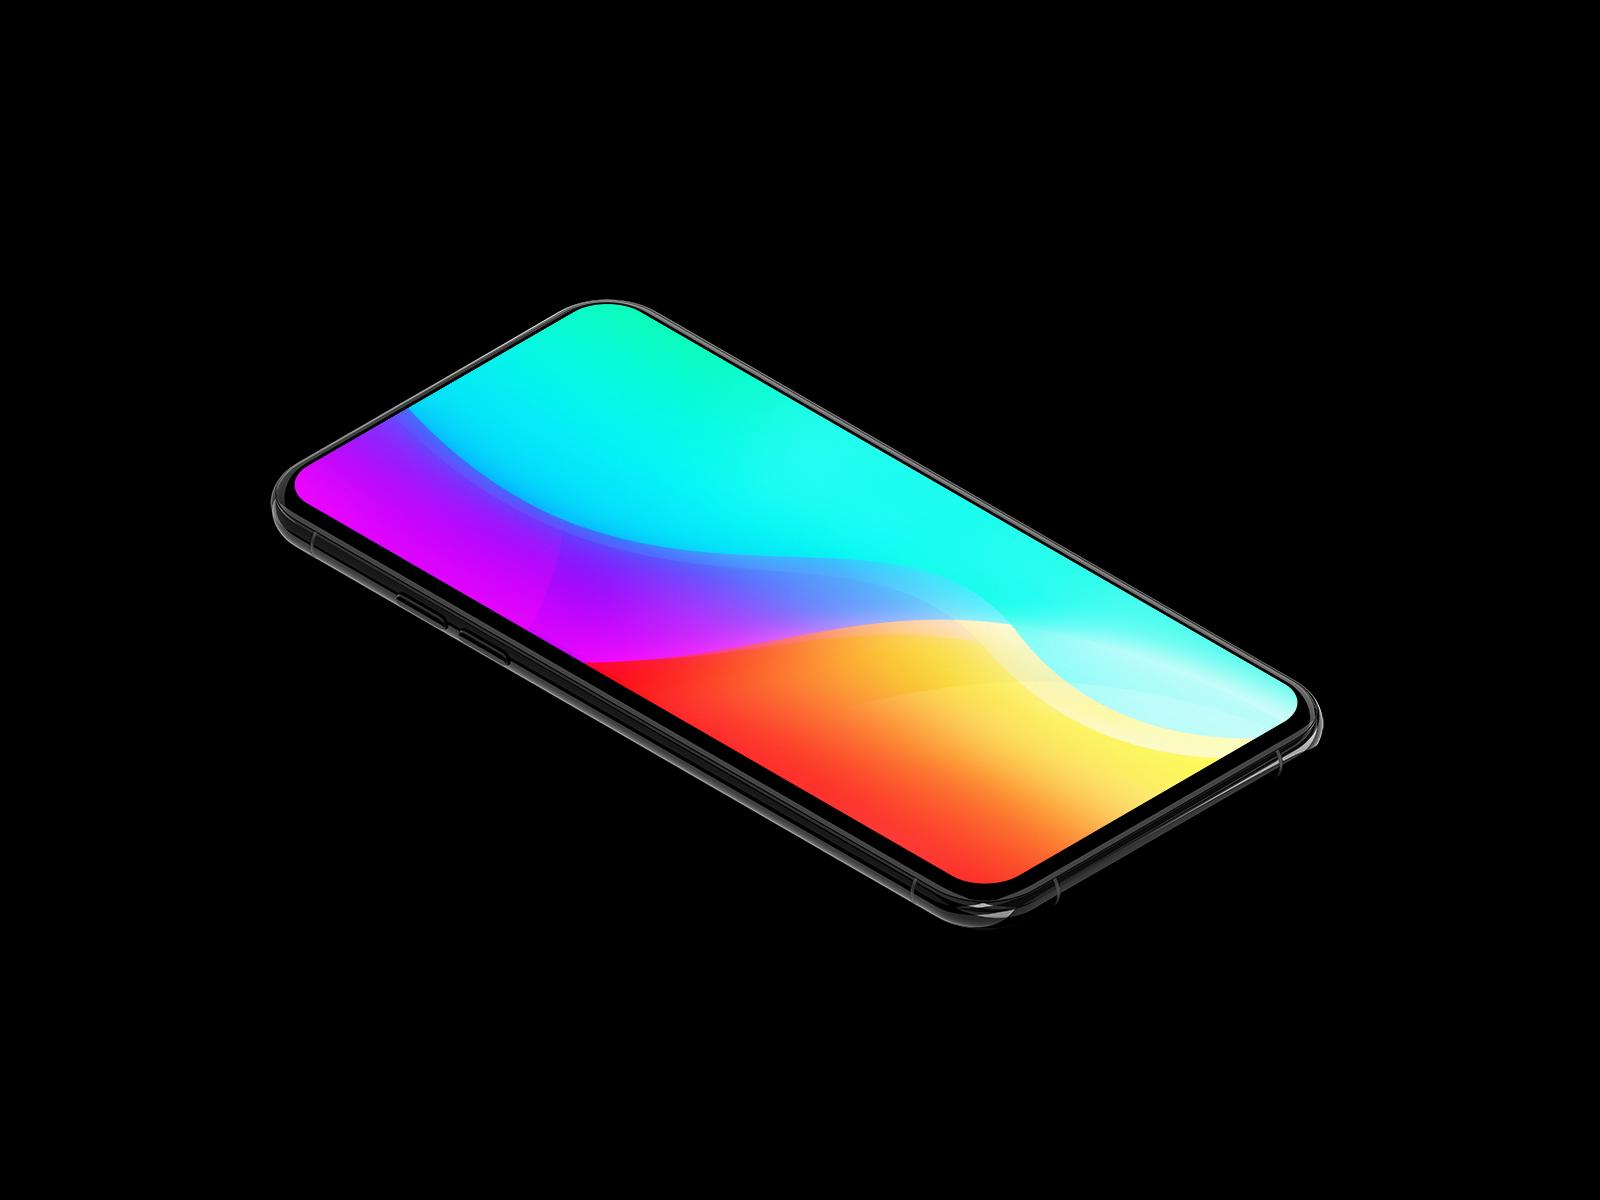 Generic Mobile Mockup (10 Colors)